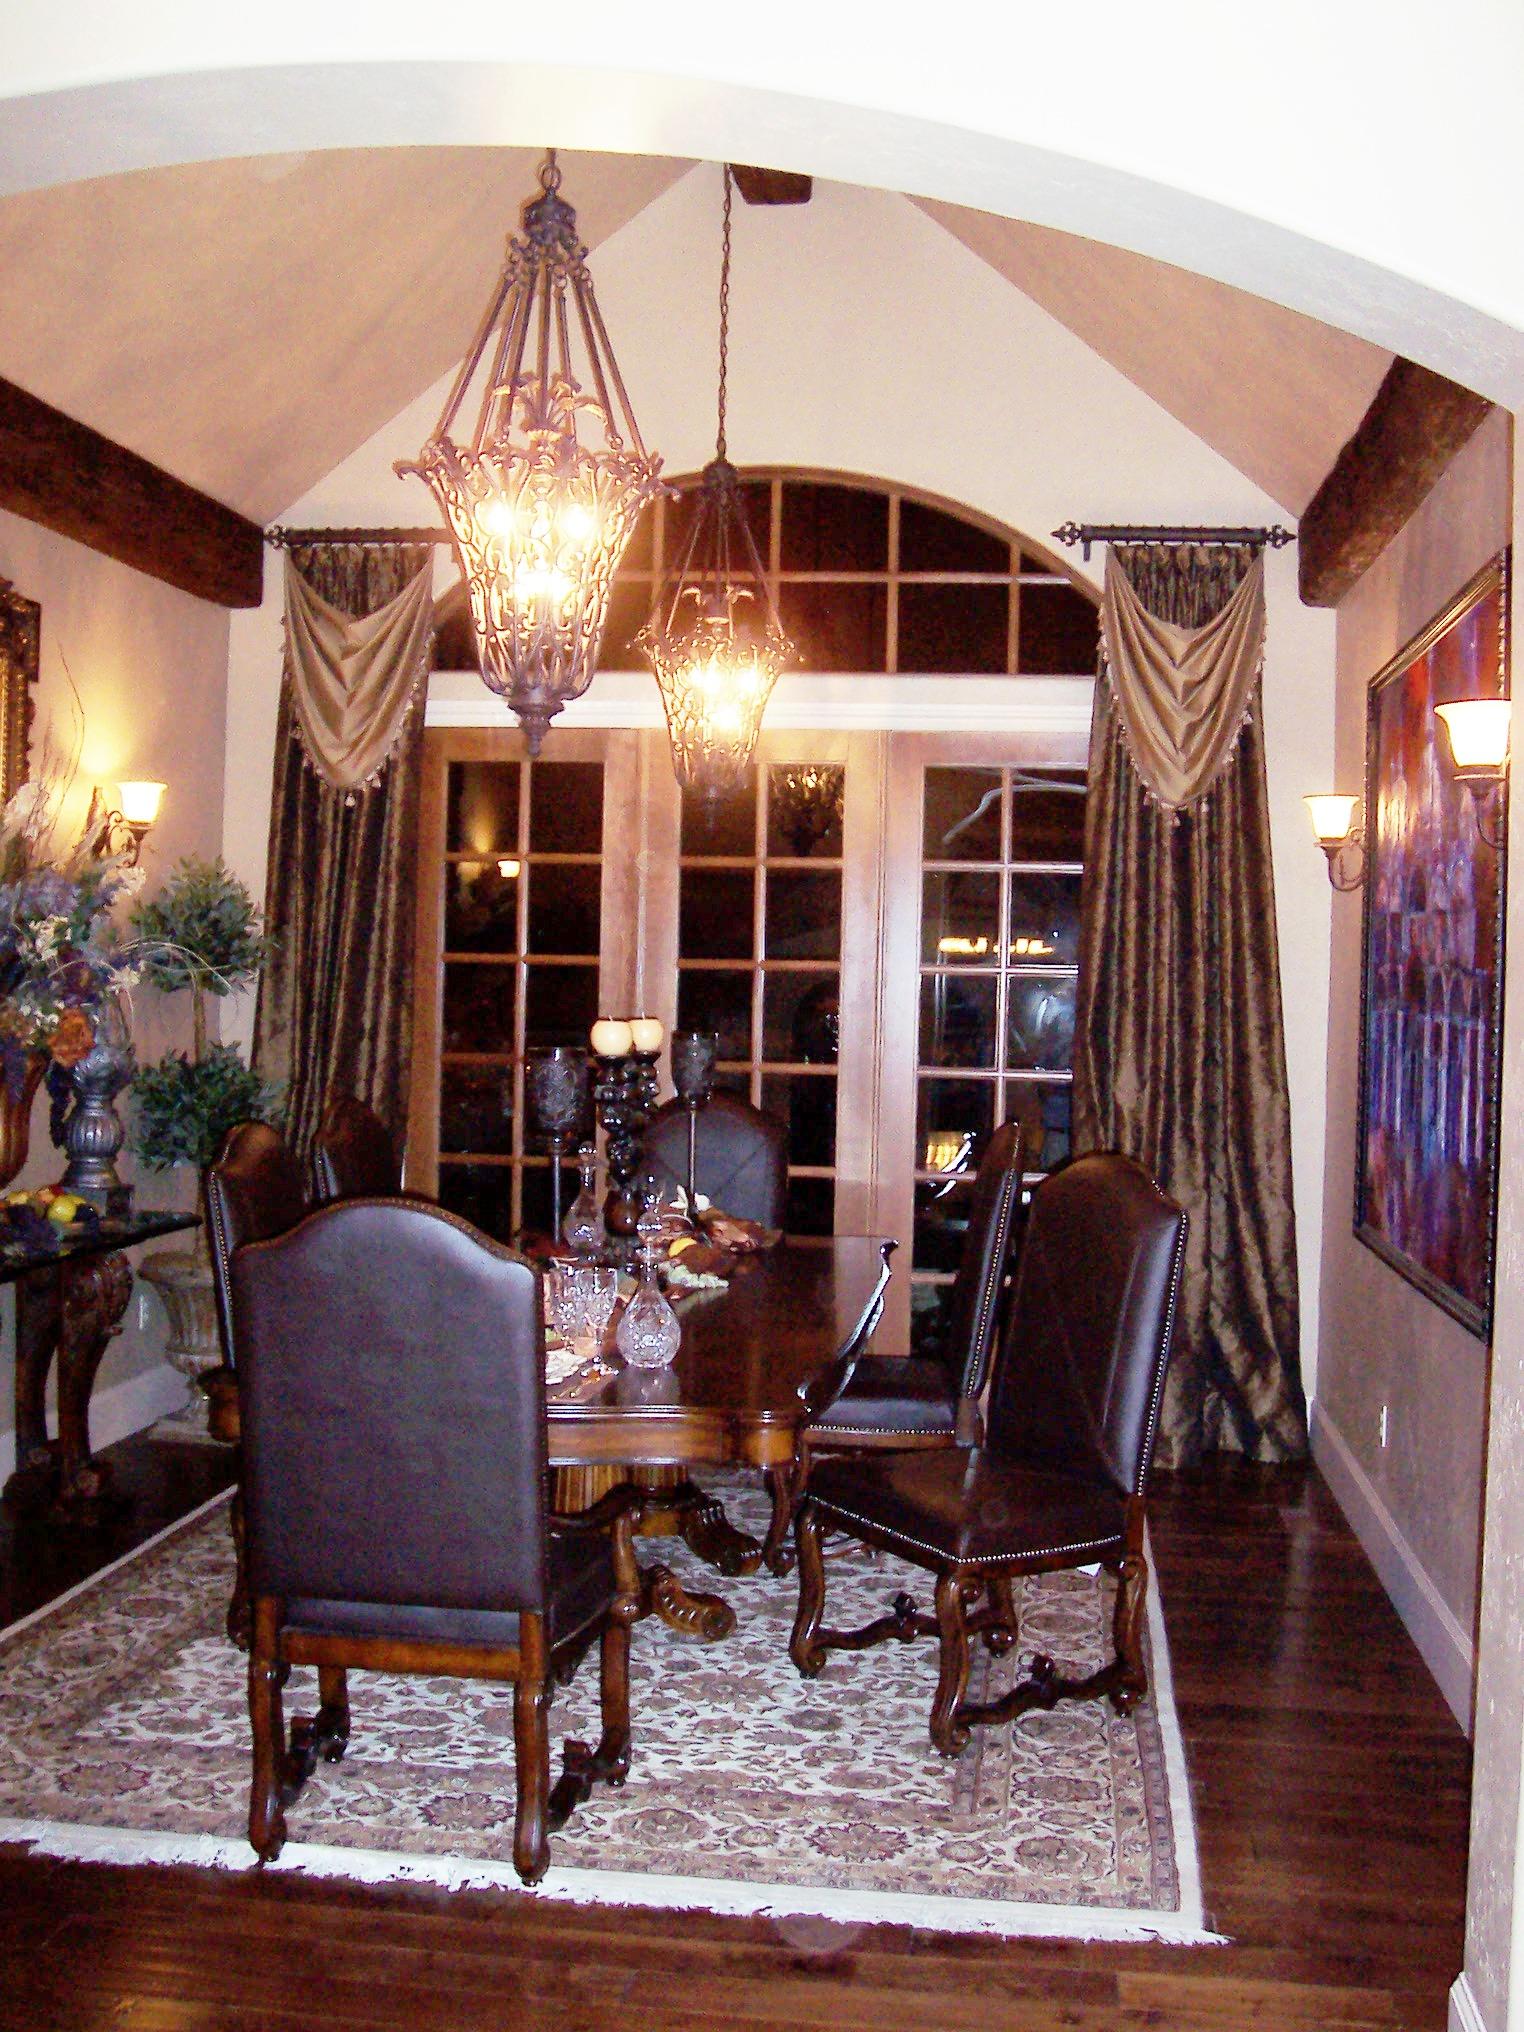 Window Treatments for Dining Room Ideas - HomesFeed on Farmhouse:-Cra1Rtrksu= Dining Room Curtains  id=52062